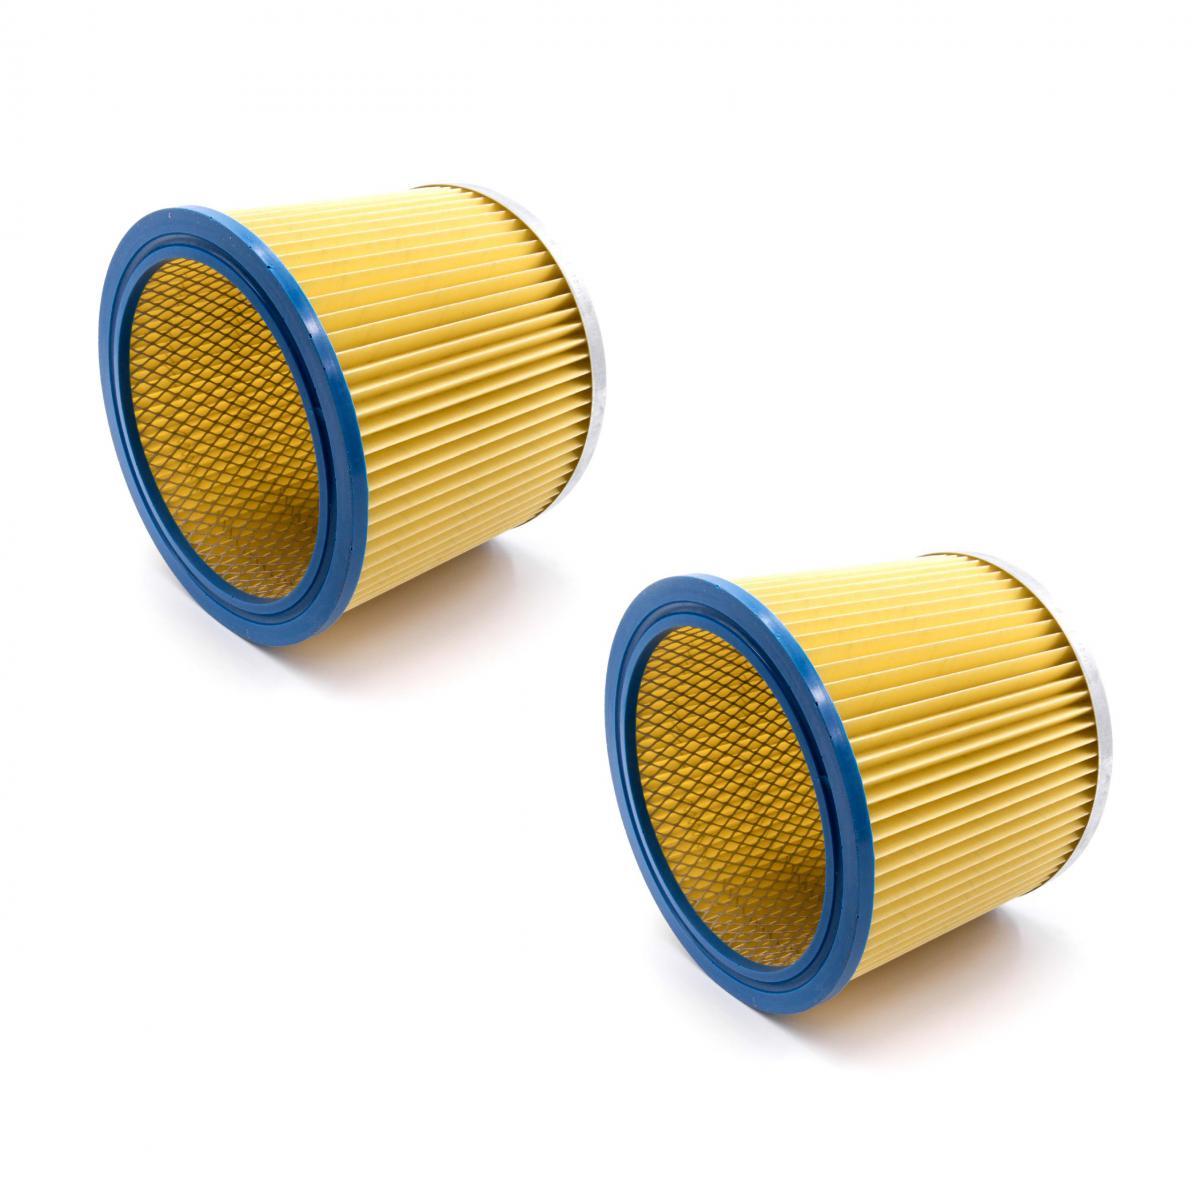 Vhbw vhbw 2x Filtre rond / filtre en lamelles pour aspirateur, robot, aspirateur multifonctions Aqua Vac Super 40, 615 S1, 61